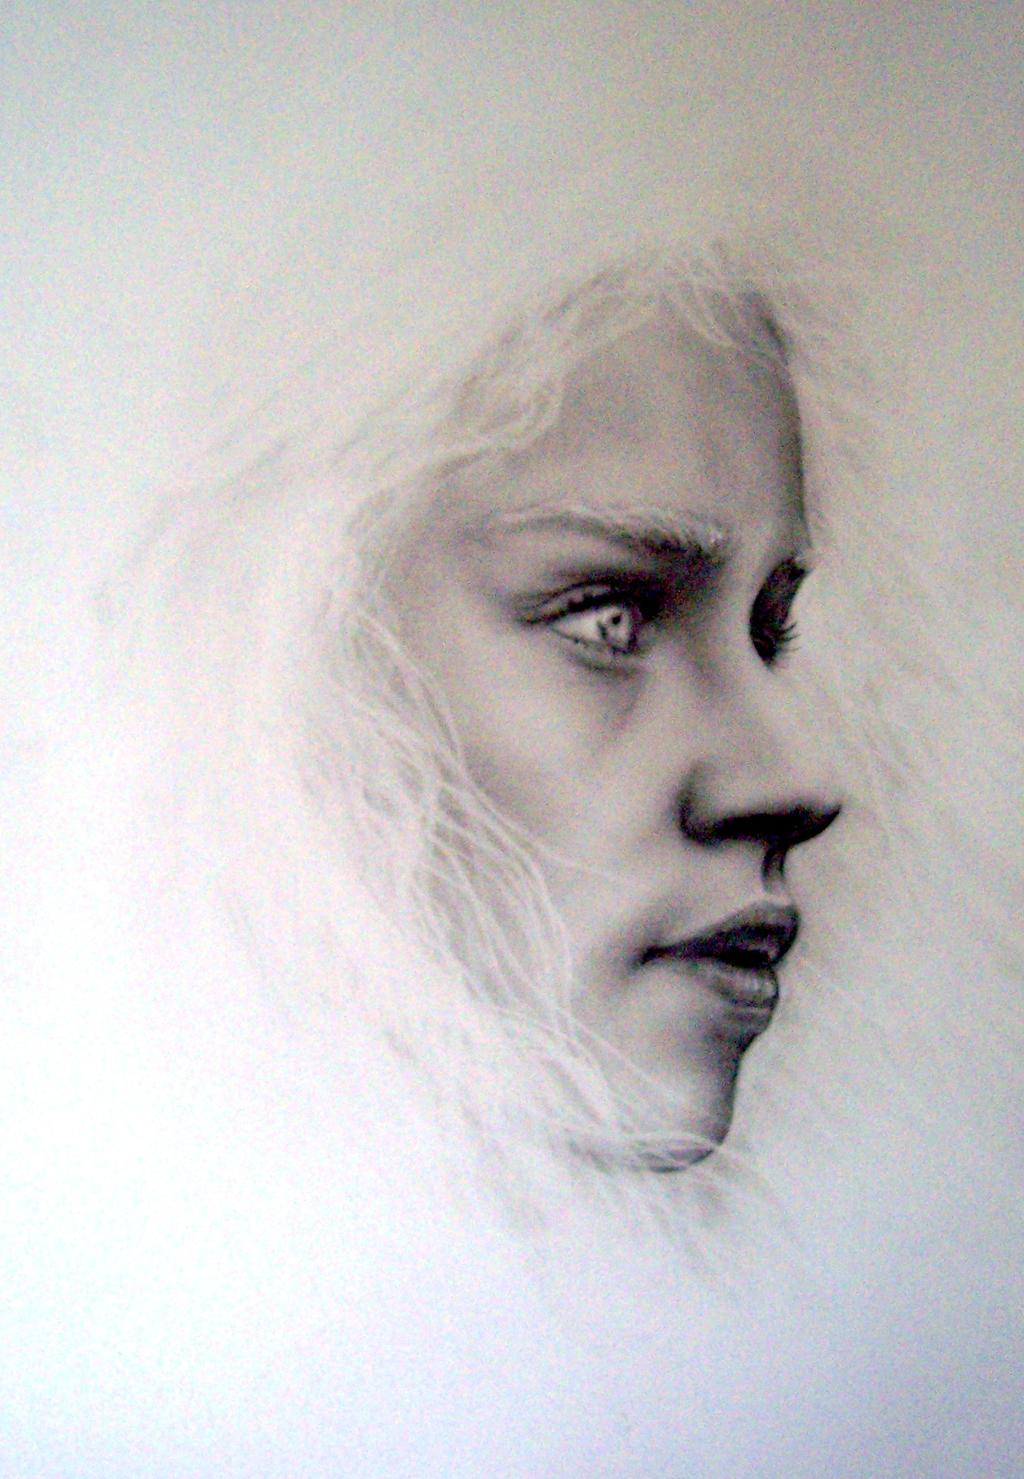 Daenerys Targaryen by Pidimoro